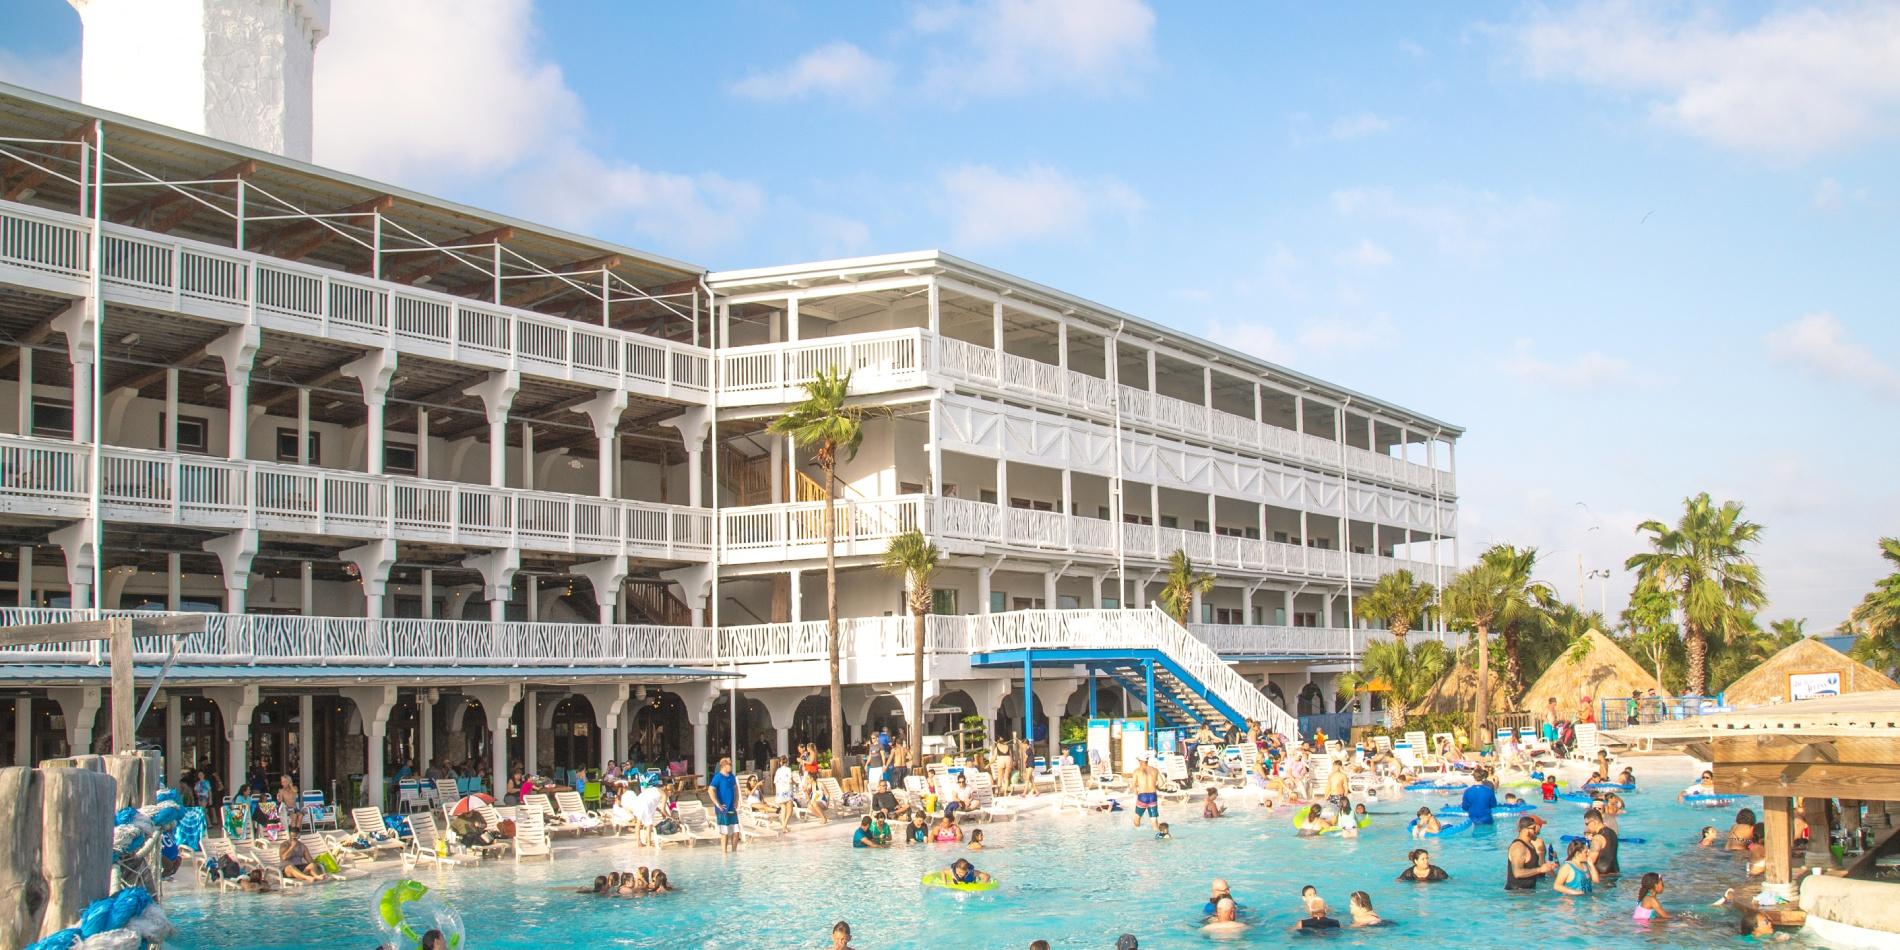 Schlitterbahn Corpus Christi Texas | Waves Resort Corpus Christi